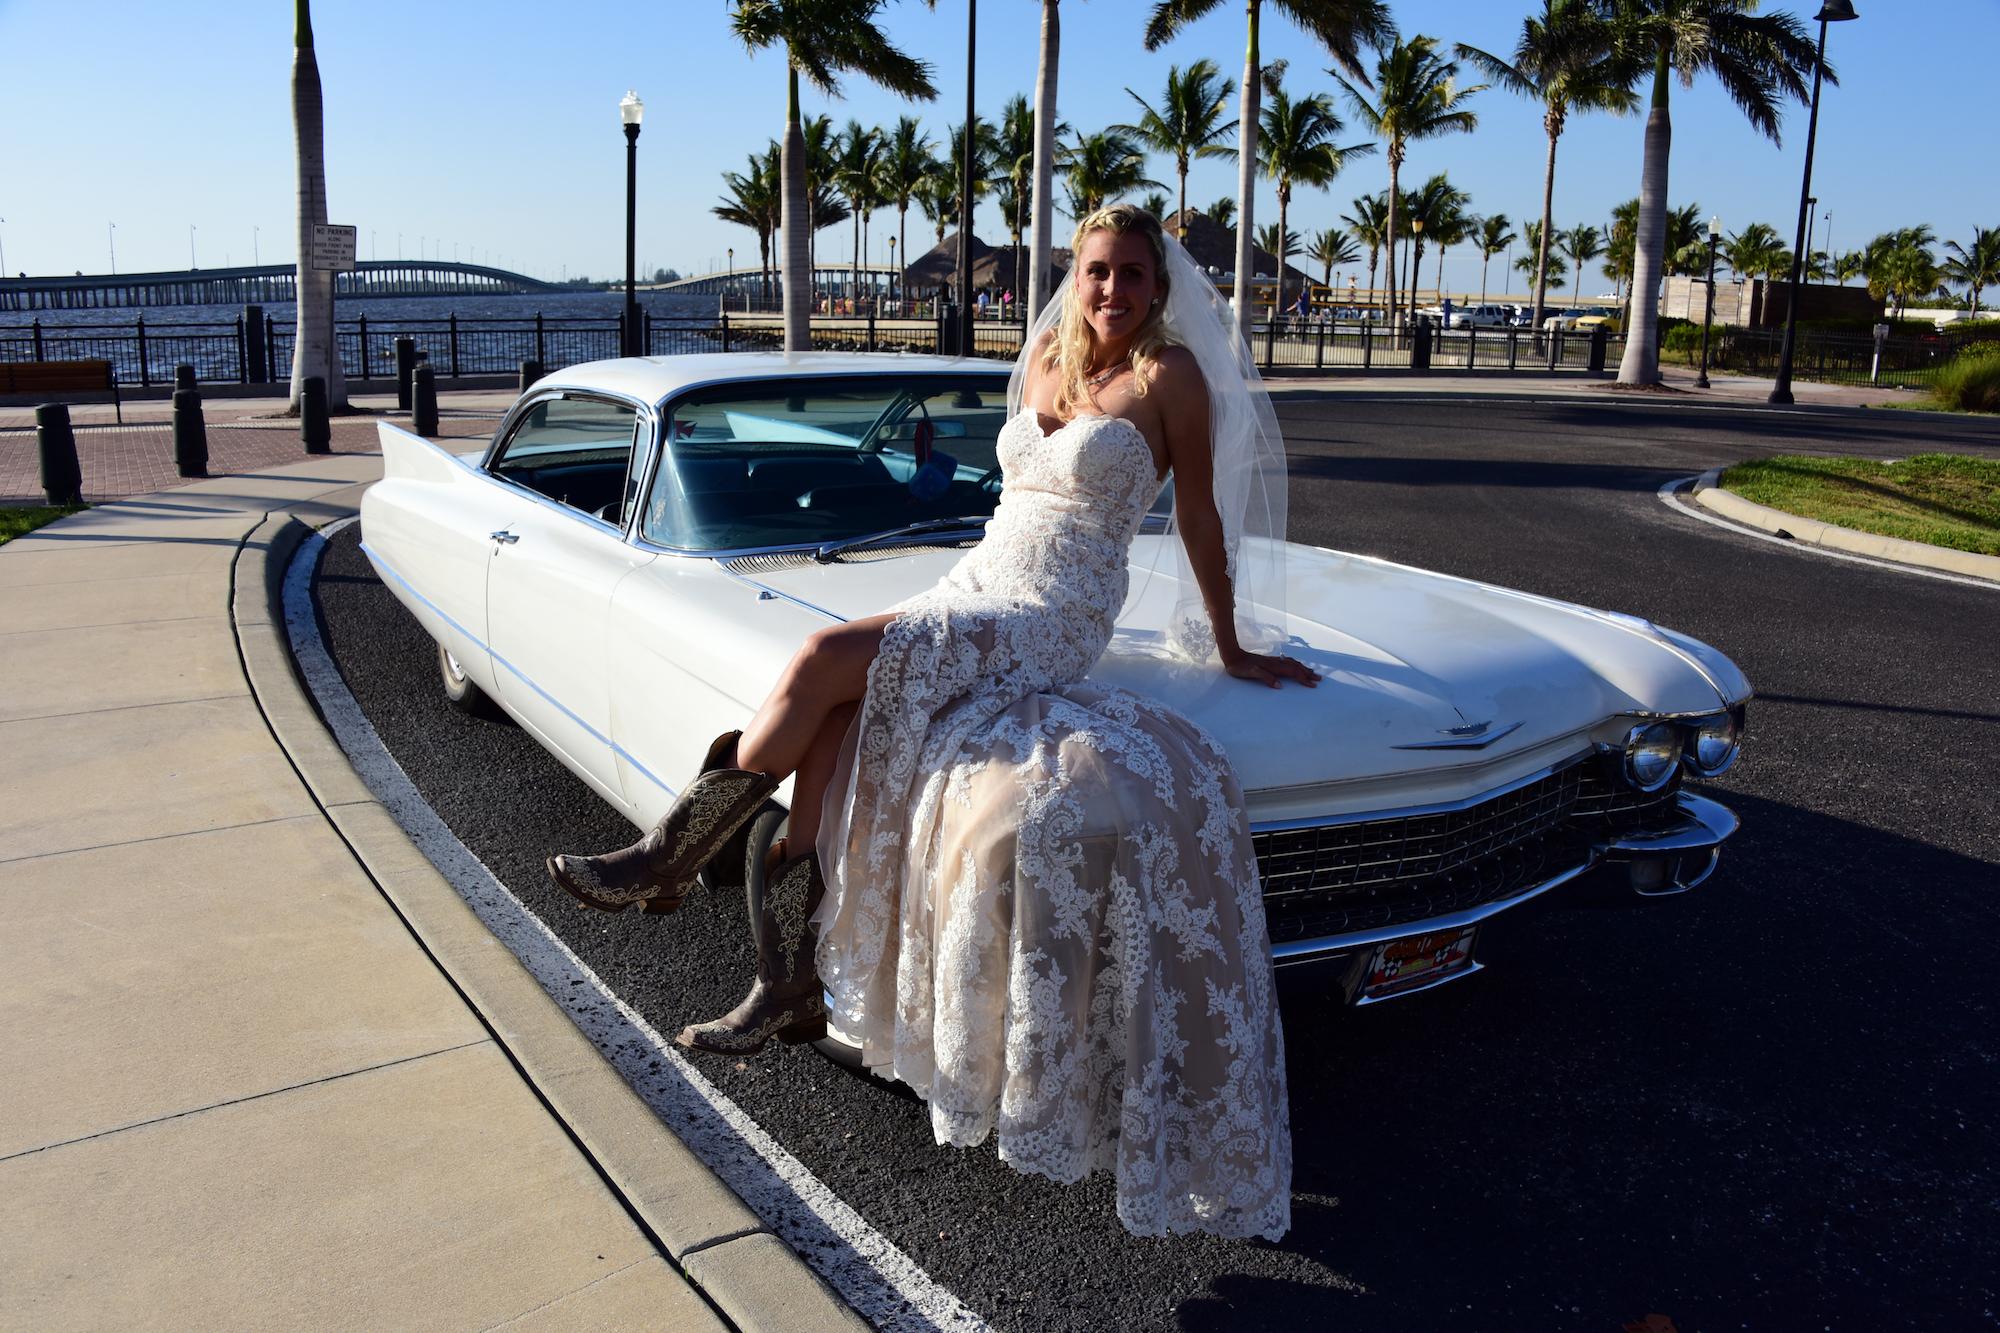 MichaelShapiro_Photography_Weddings_169.JPG